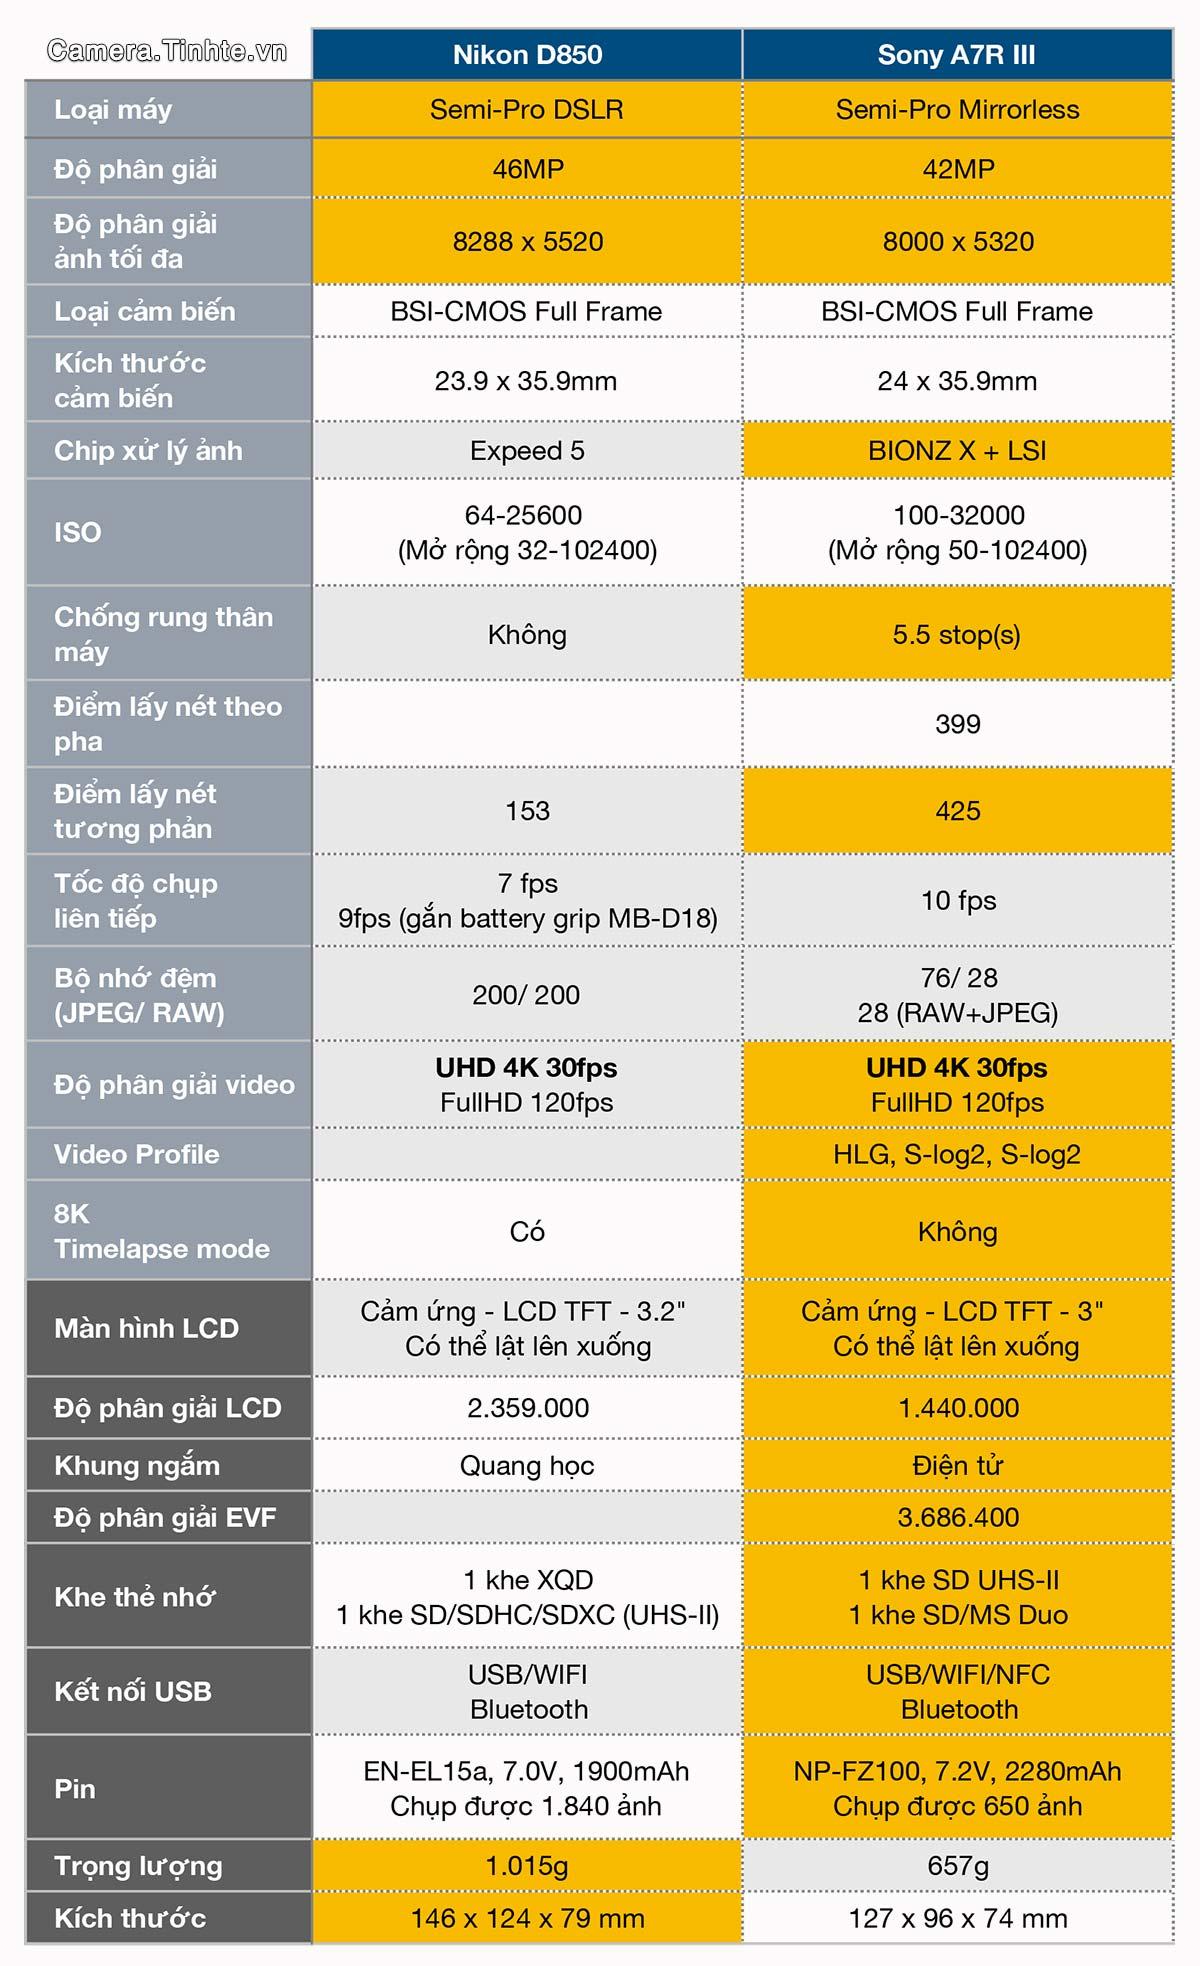 Đang tải So-sanh-Nikon-D850-vs-Sony-A7R-III.jpg…